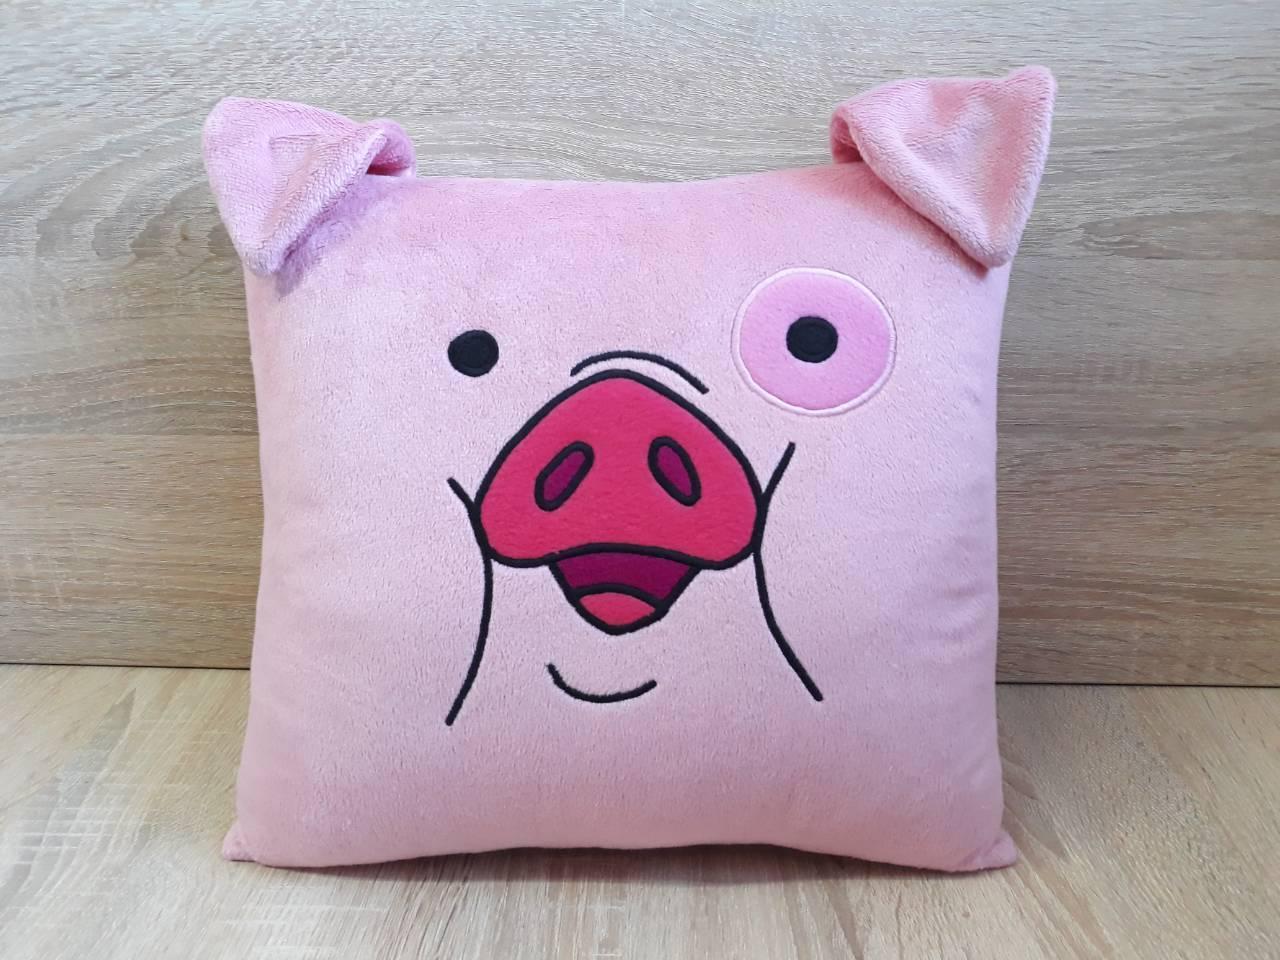 Декоративная подушка свинка Пухля (Вадлс) из Гравити Фолз, ручная работа